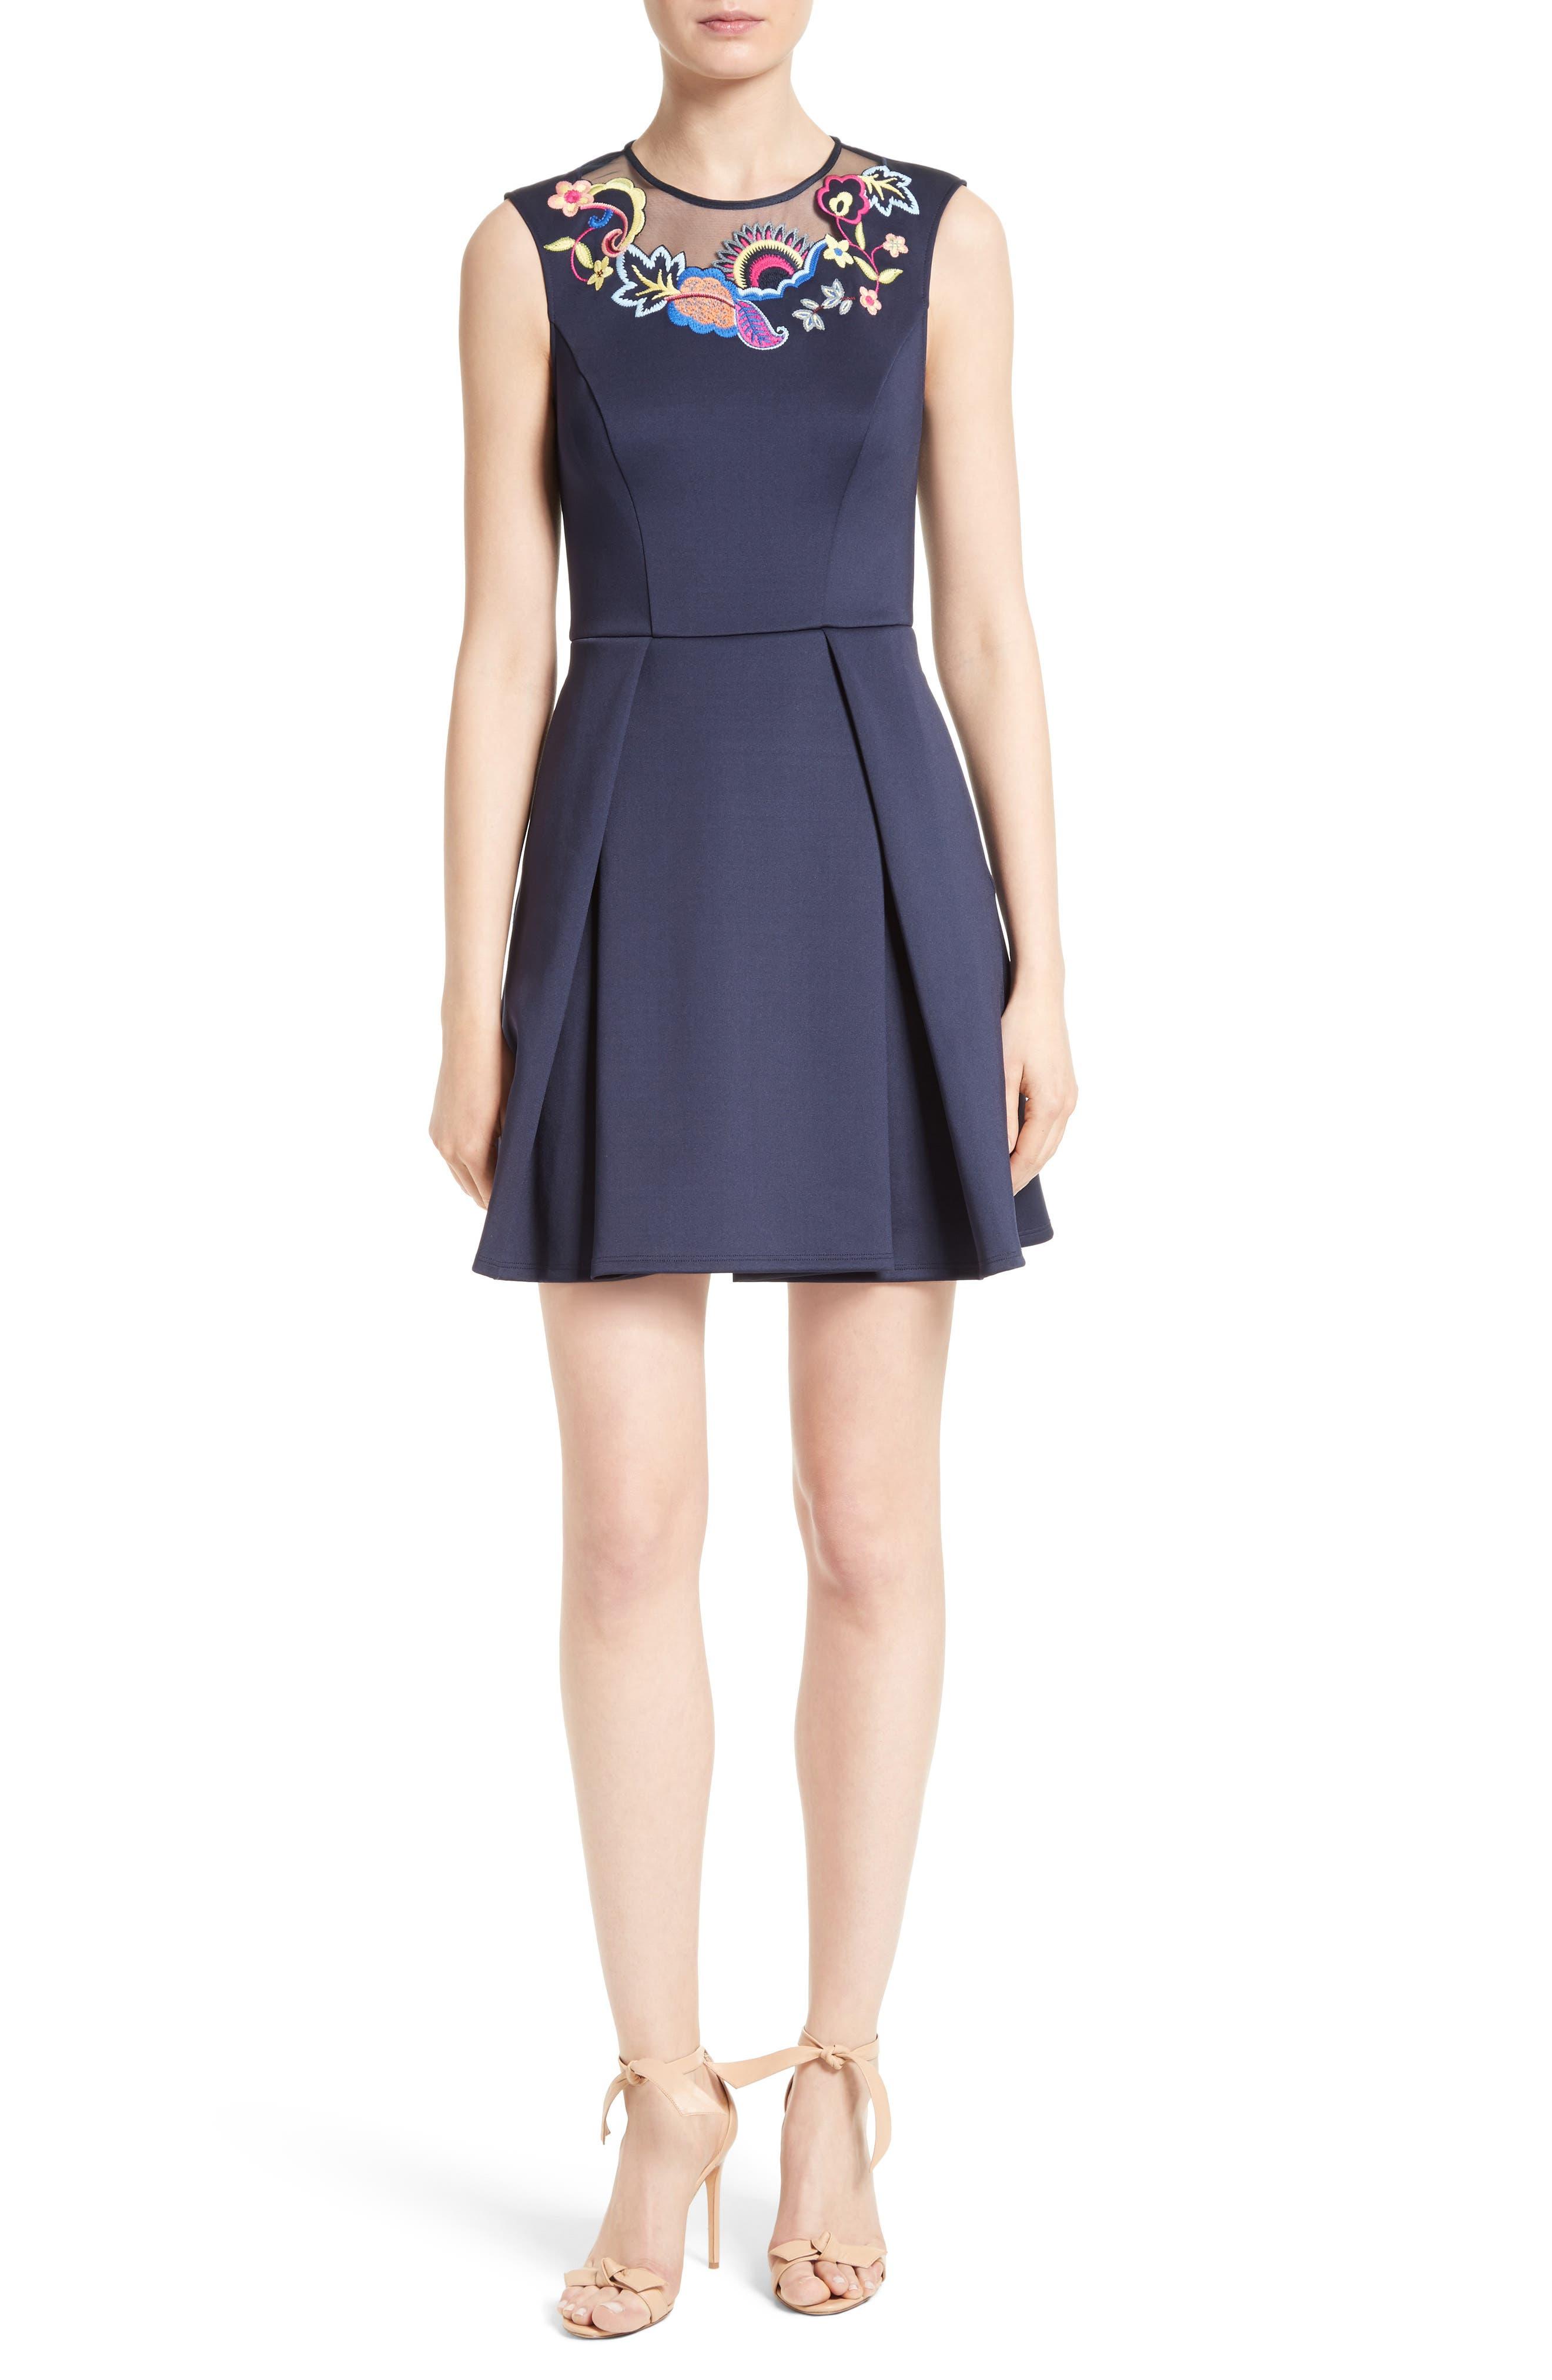 Alternate Image 1 Selected - Ted Baker London Lavensa Fit & Flare Dress